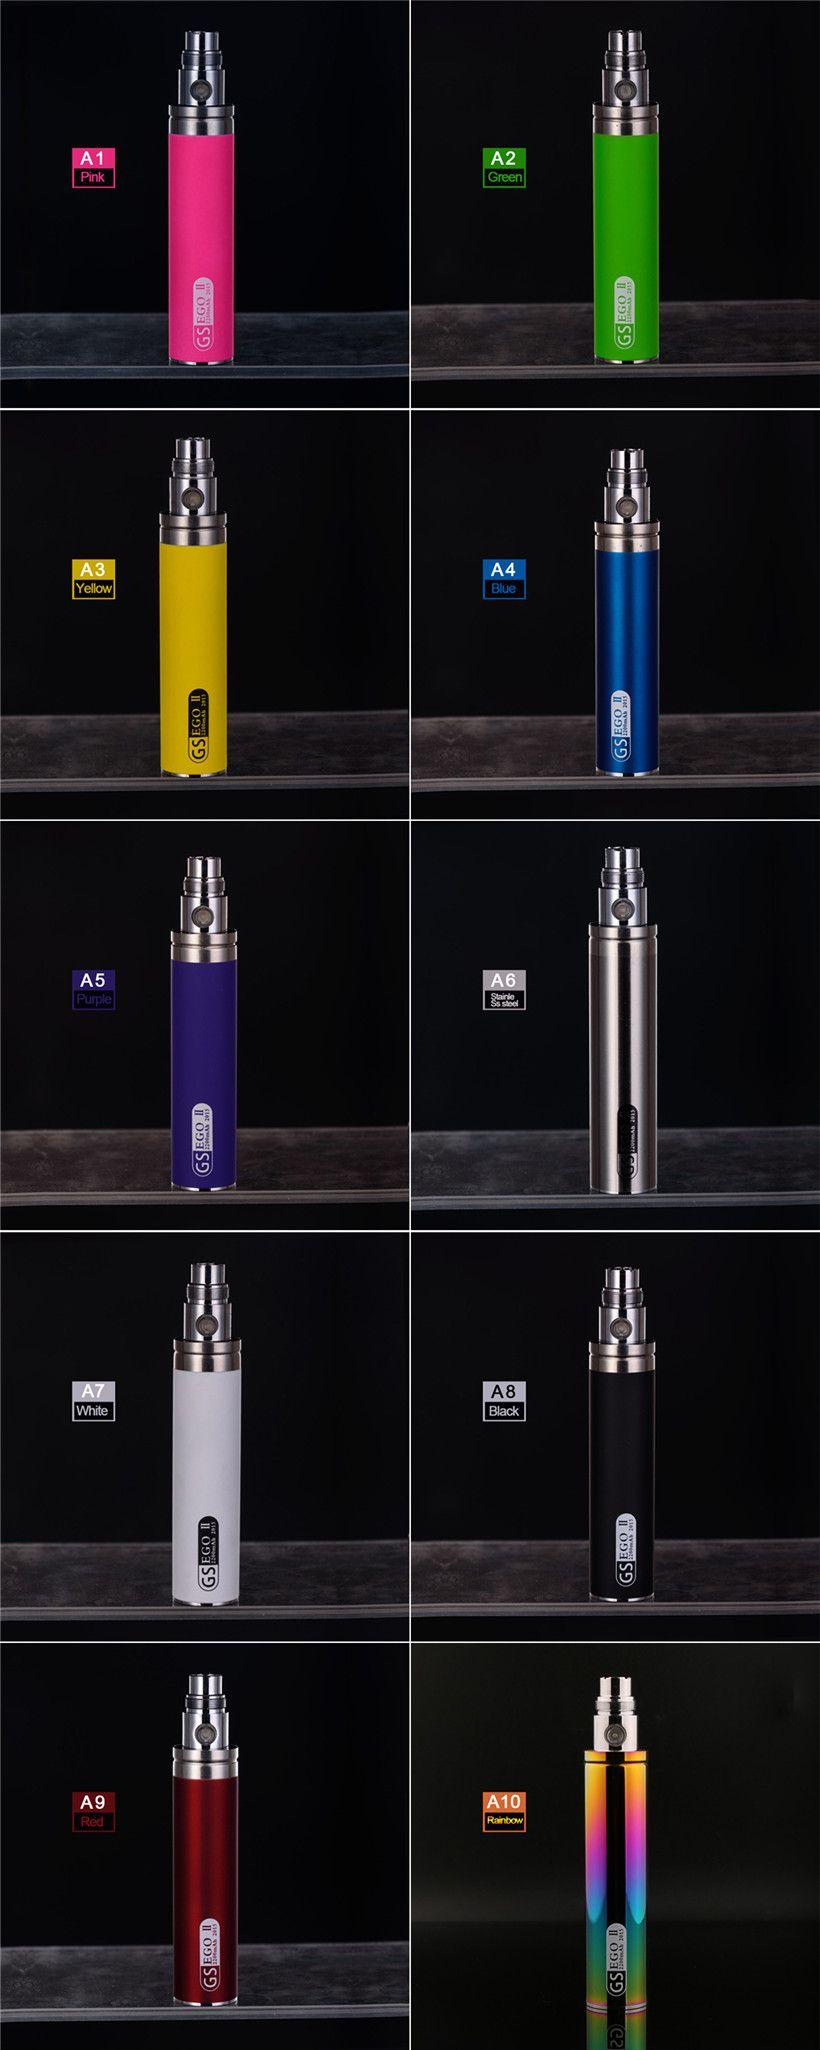 GS EGO II 2200 mAH E Sigara Pil Lumia Edition 3D Şekil Renkli 2200 MAH EGO T Piller Buharlaştırıcı Kalem Fit 510 Konu Atomizörler